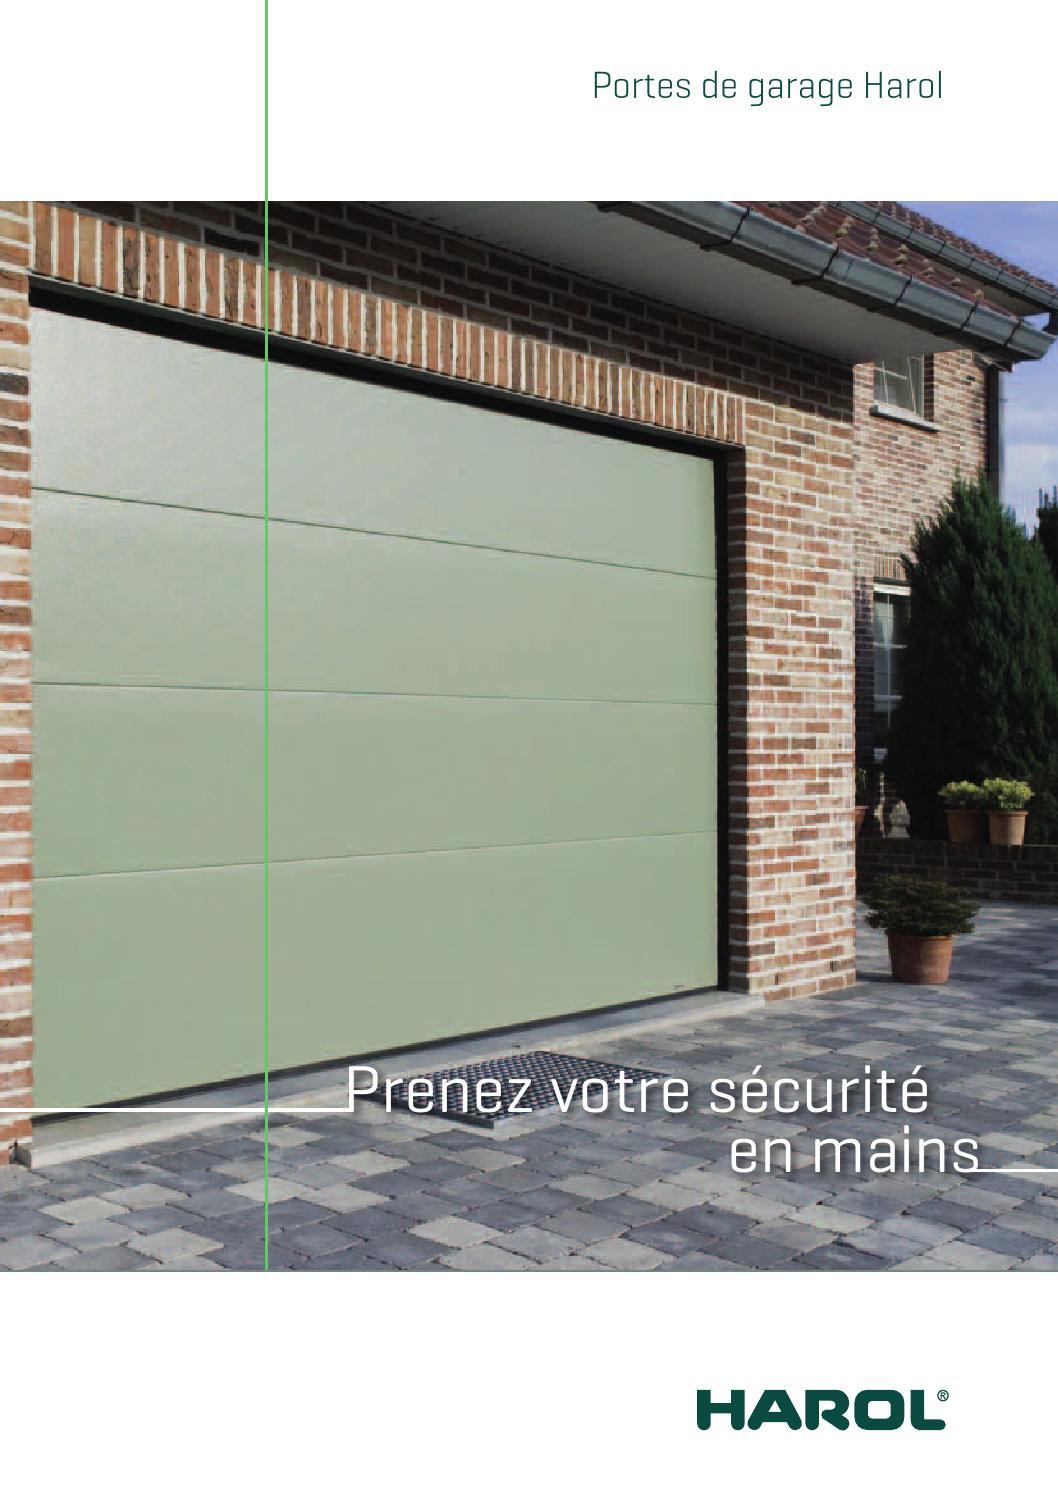 brochure harol portes de garage by marleen draelants issuu